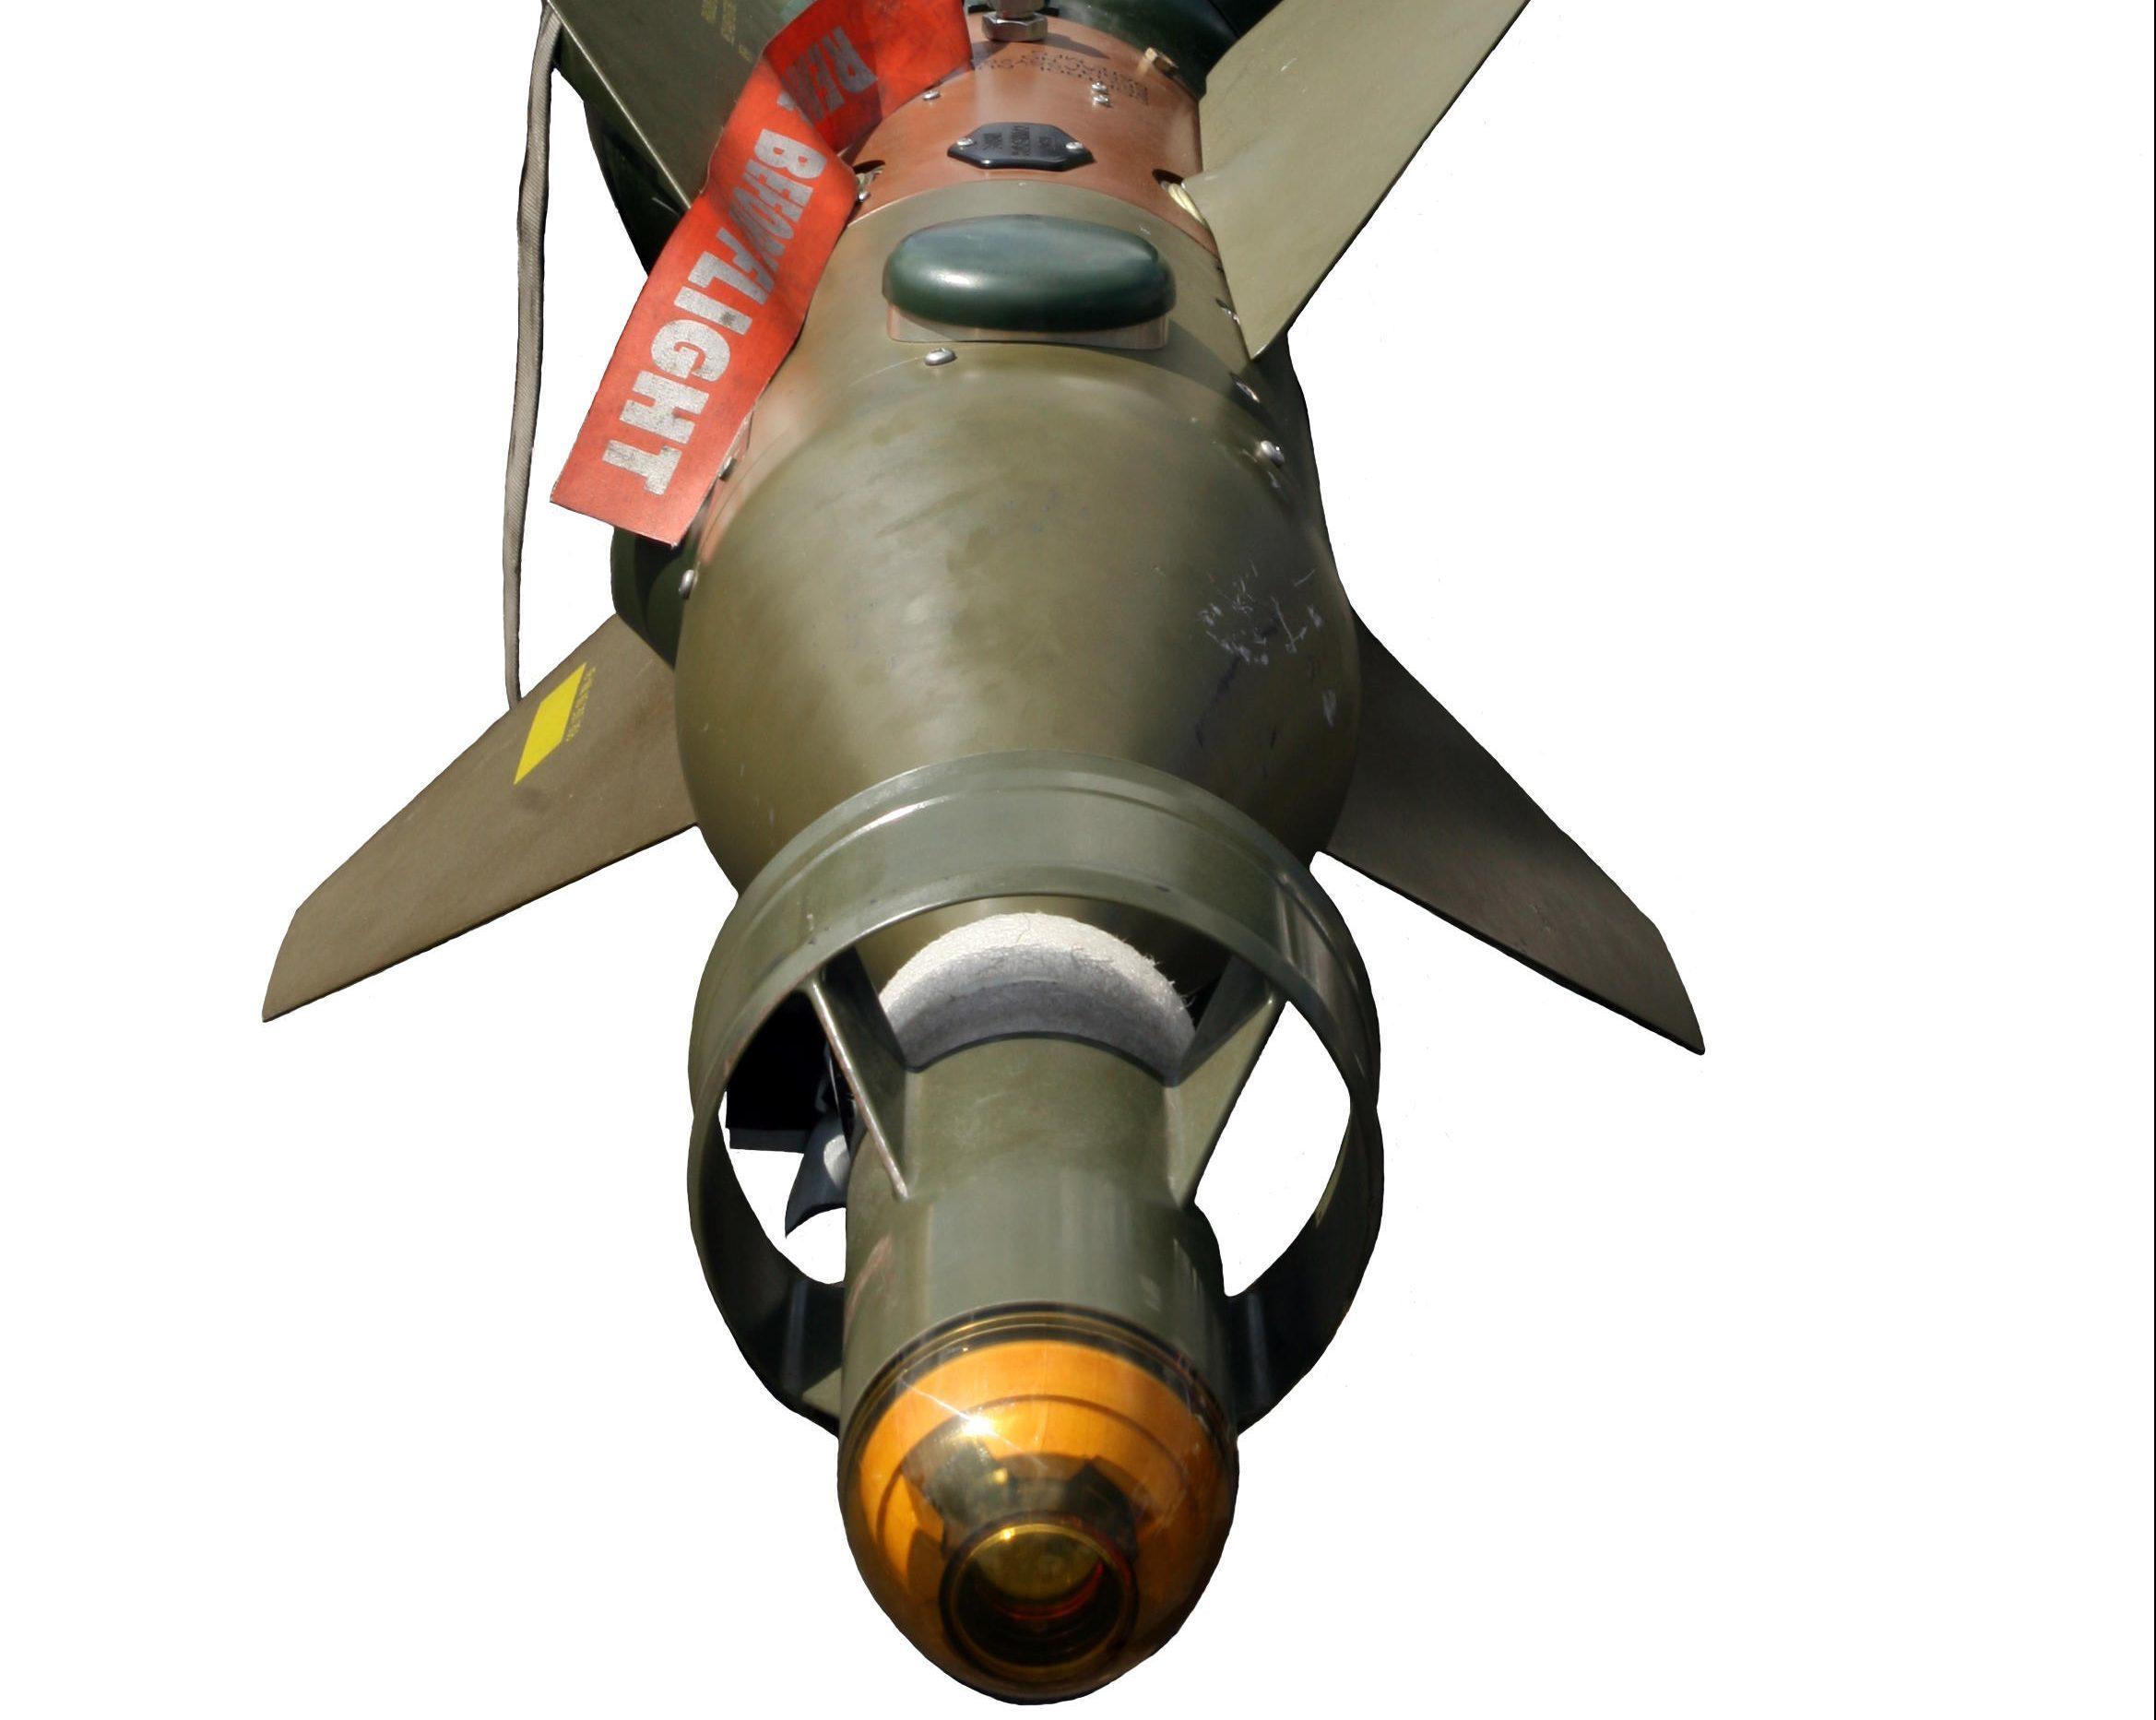 Paveway 1000lb laser guided bomb